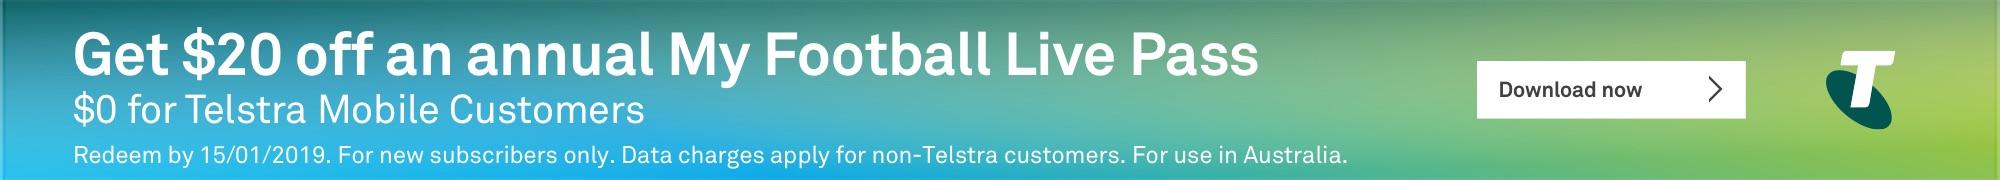 Telstra Banner HAL